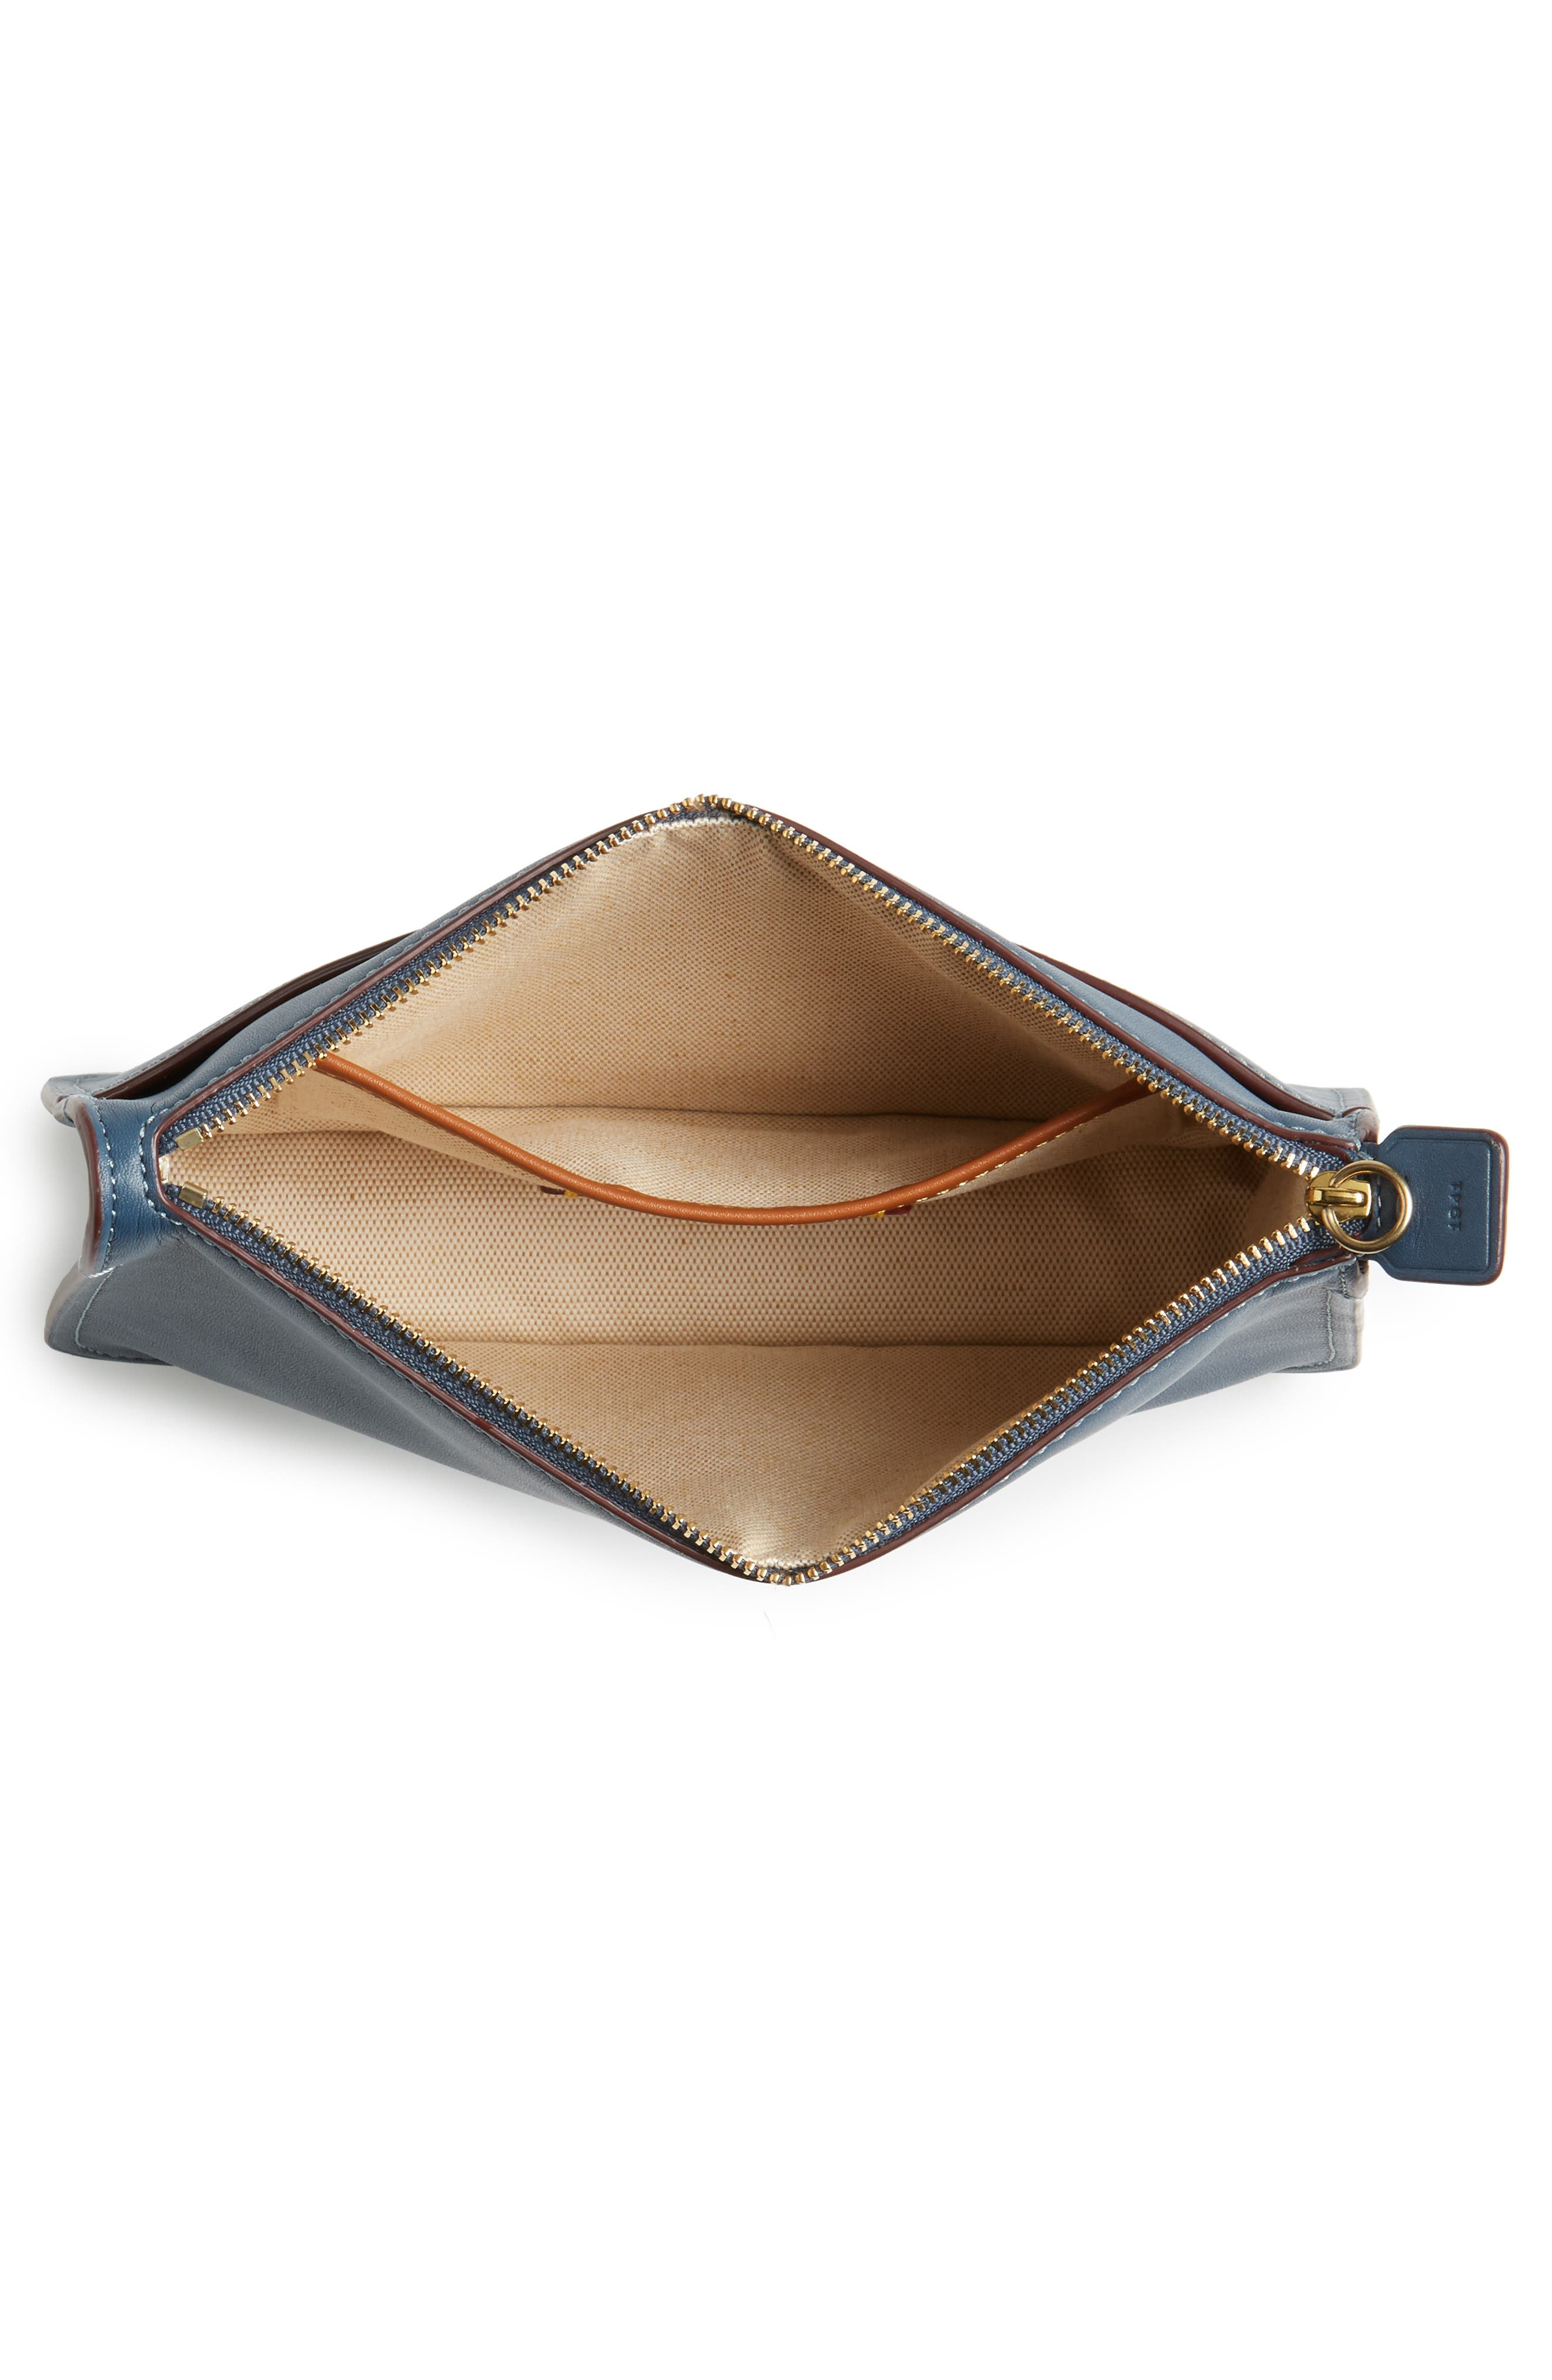 Soho Leather Crossbody Bag,                             Alternate thumbnail 4, color,